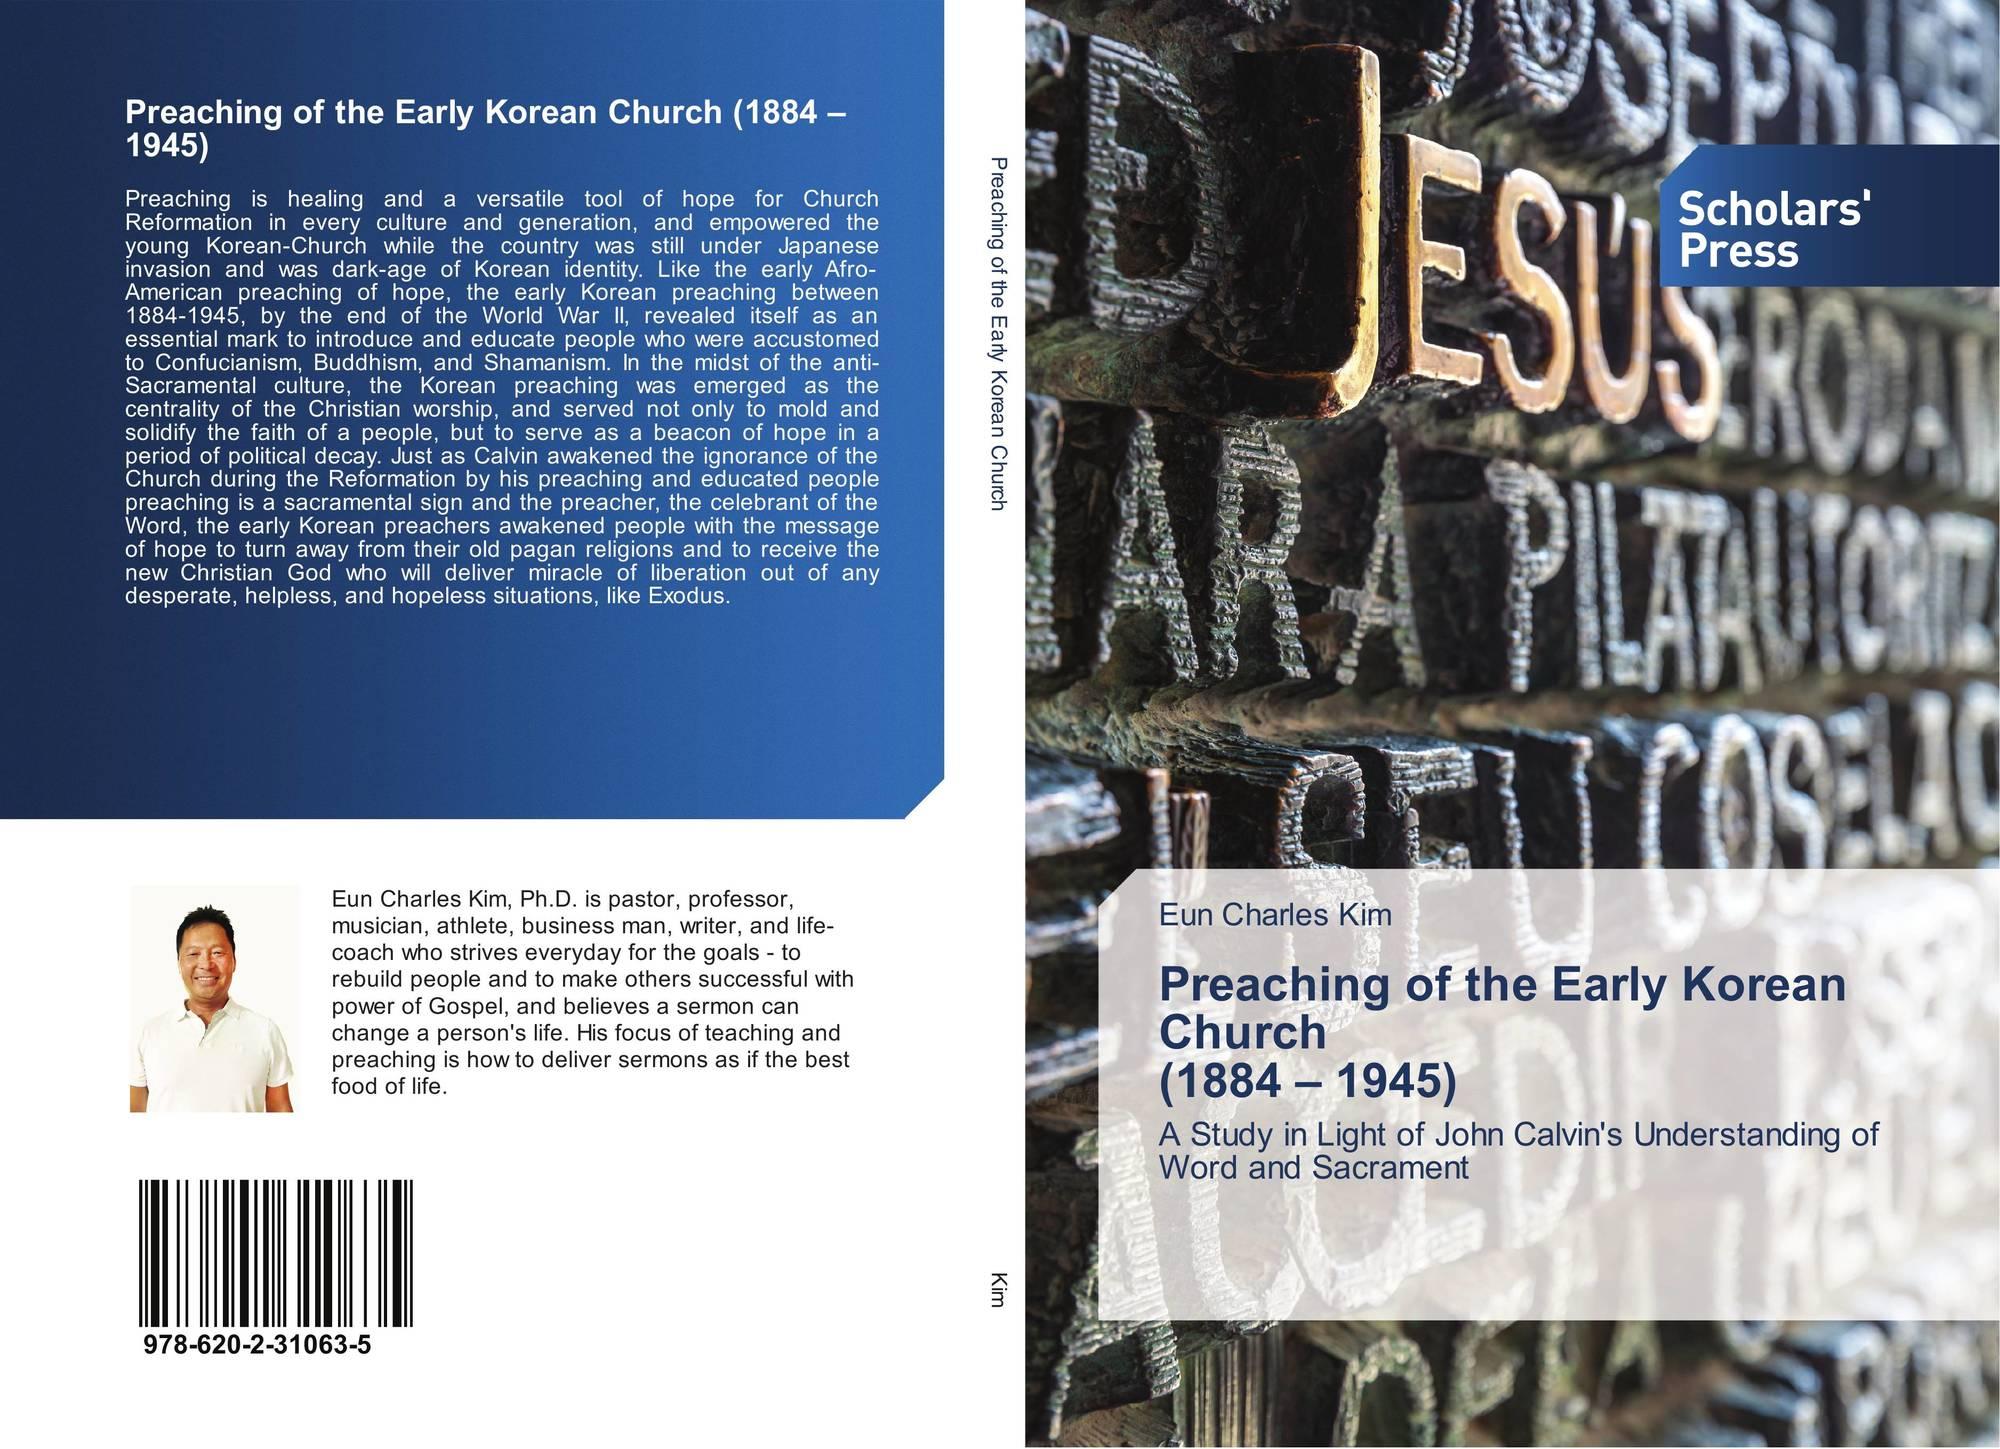 Preaching of the Early Korean Church (1884 – 1945), 978-620-2-31063